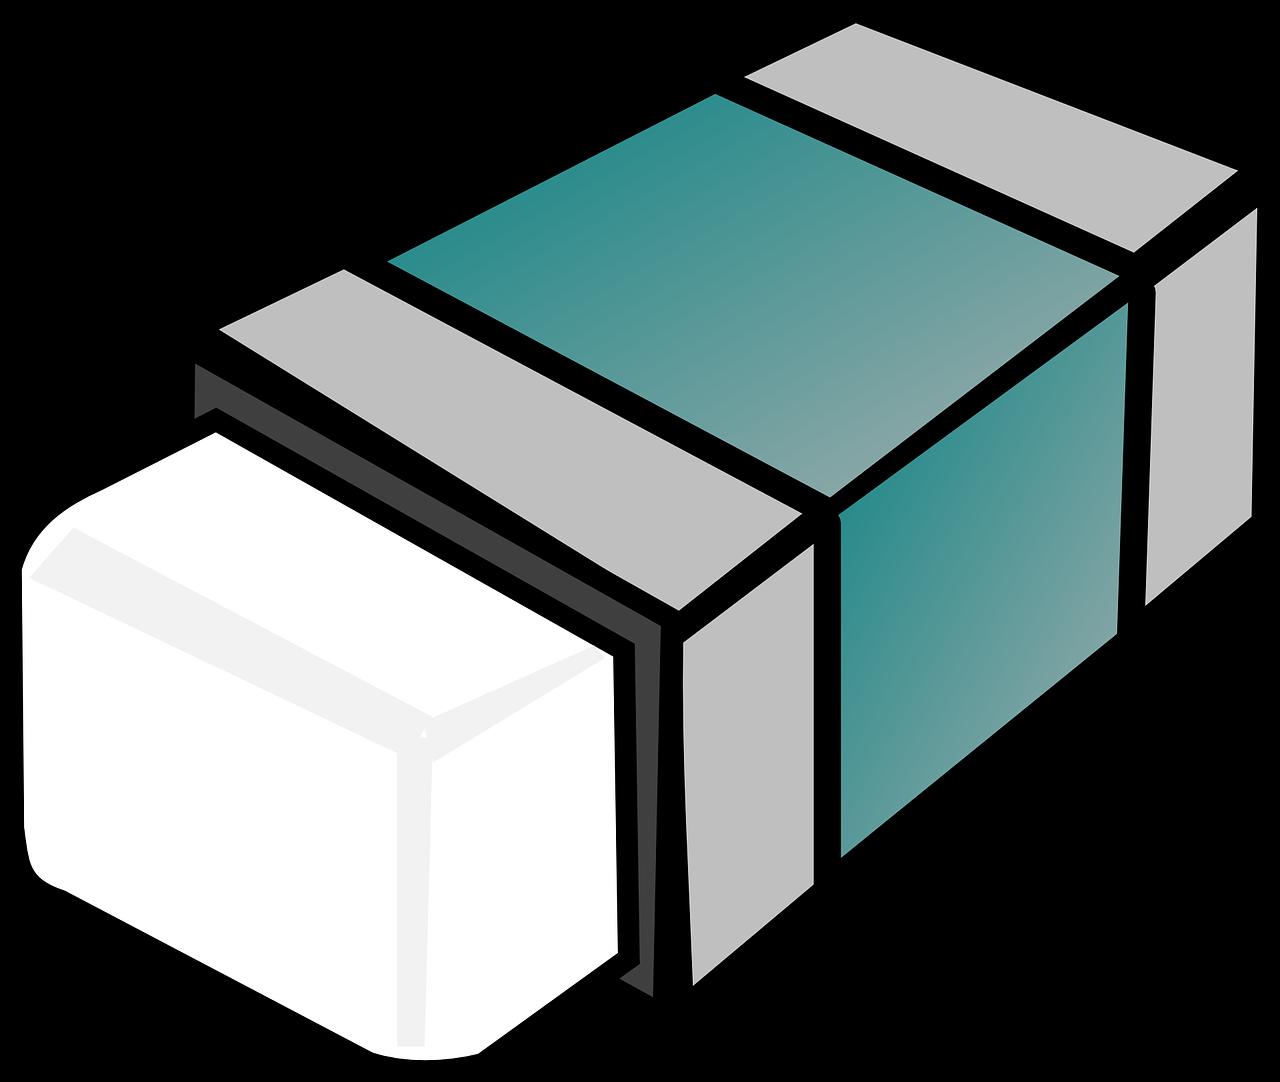 Eraser clipart horizontal.  collection of an